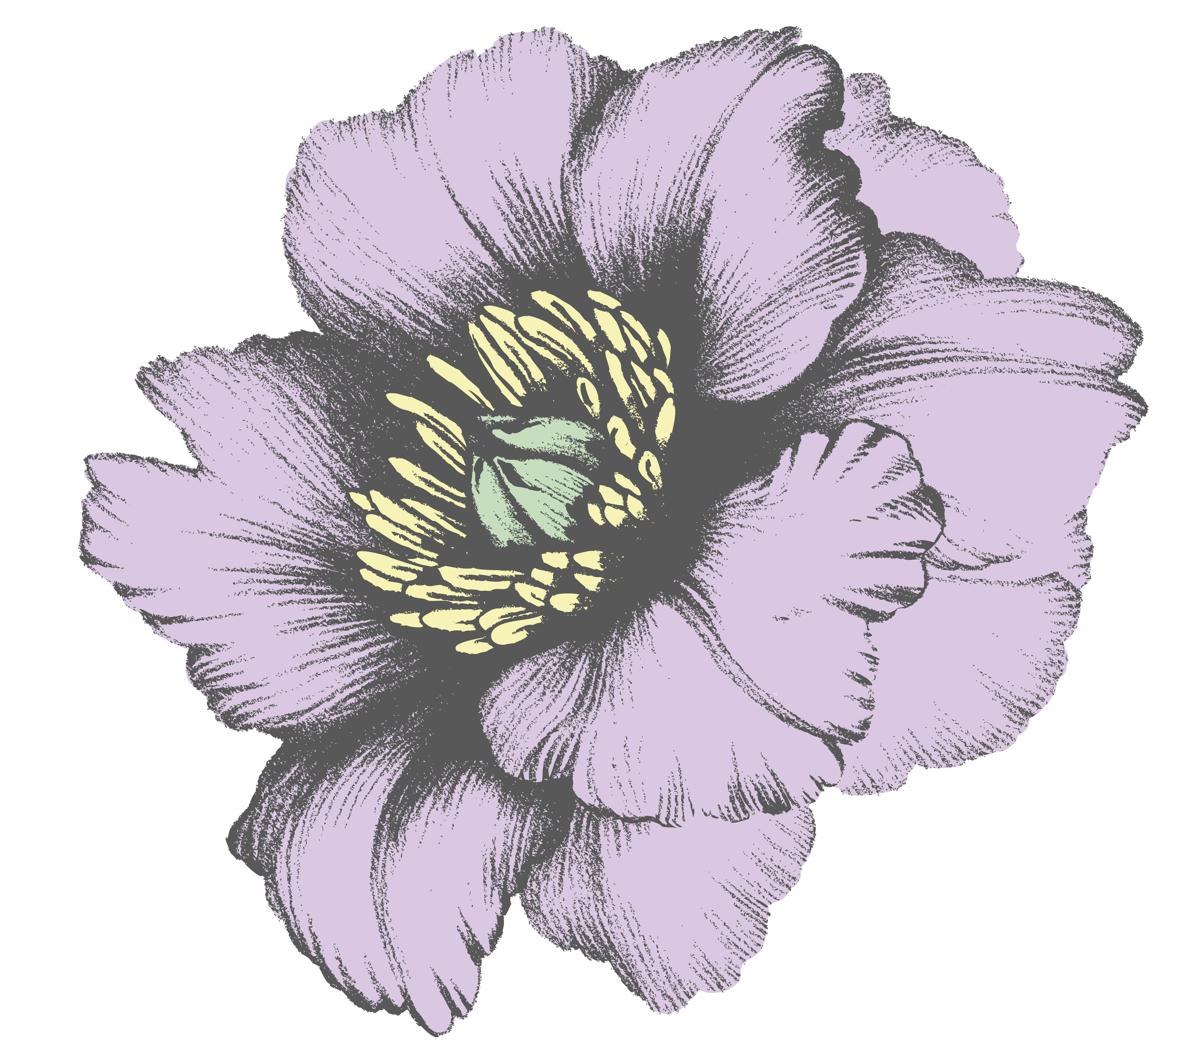 Single Lotus Flower Lotus Flower A Single Lotus Flower In A Small Garden At Lotus Flower